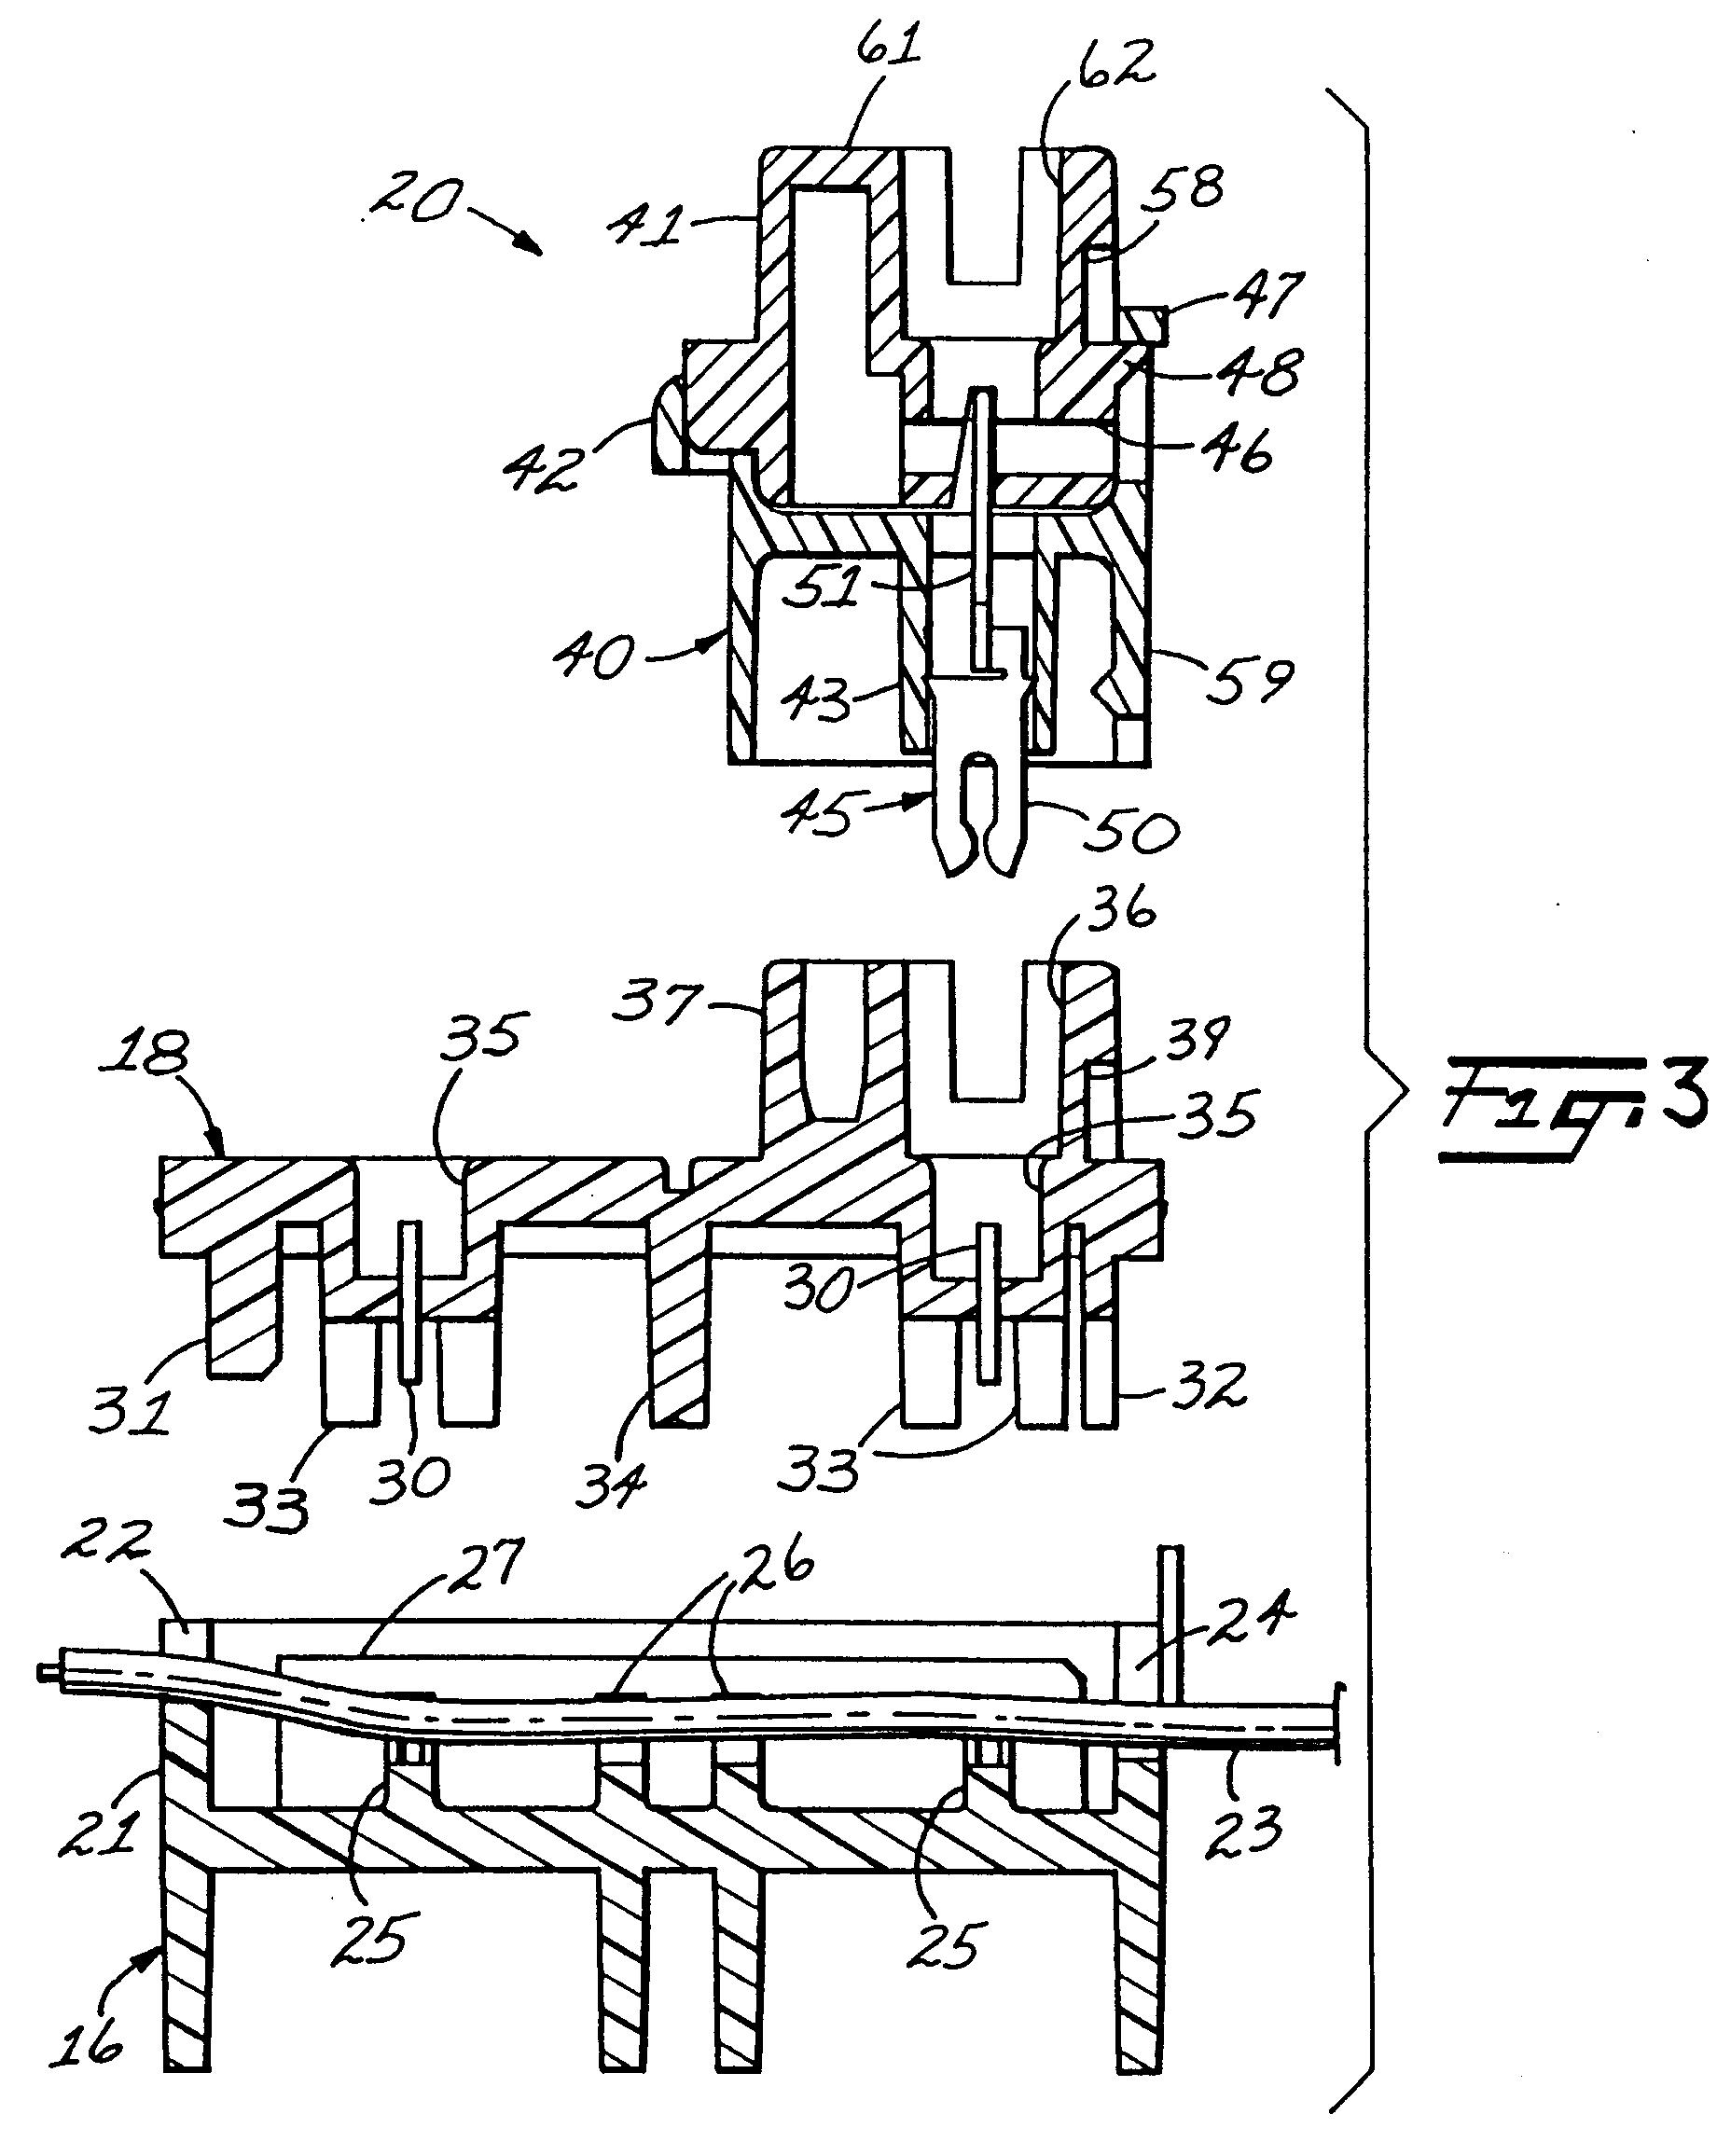 Nice Rj31x Wiring Diagram Gallery - Electrical Circuit Diagram .